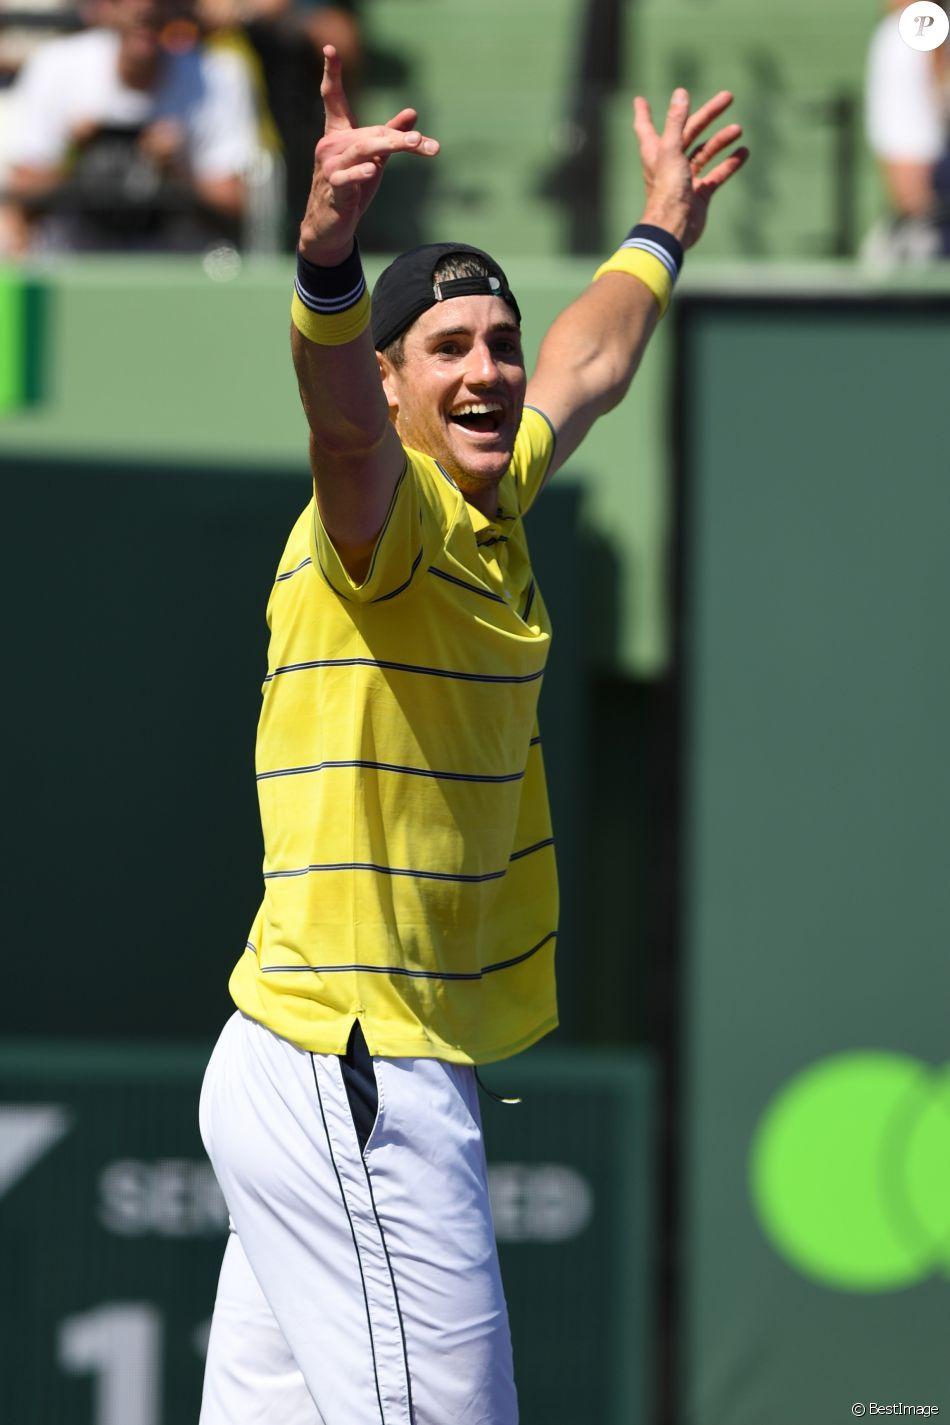 John Isner - John Isner a battu Alexander Zverev lors de la finale masculine du Miami Open au Crandon Park Tennis Center à Key Biscayne en Floride, le 1er avril 2018.